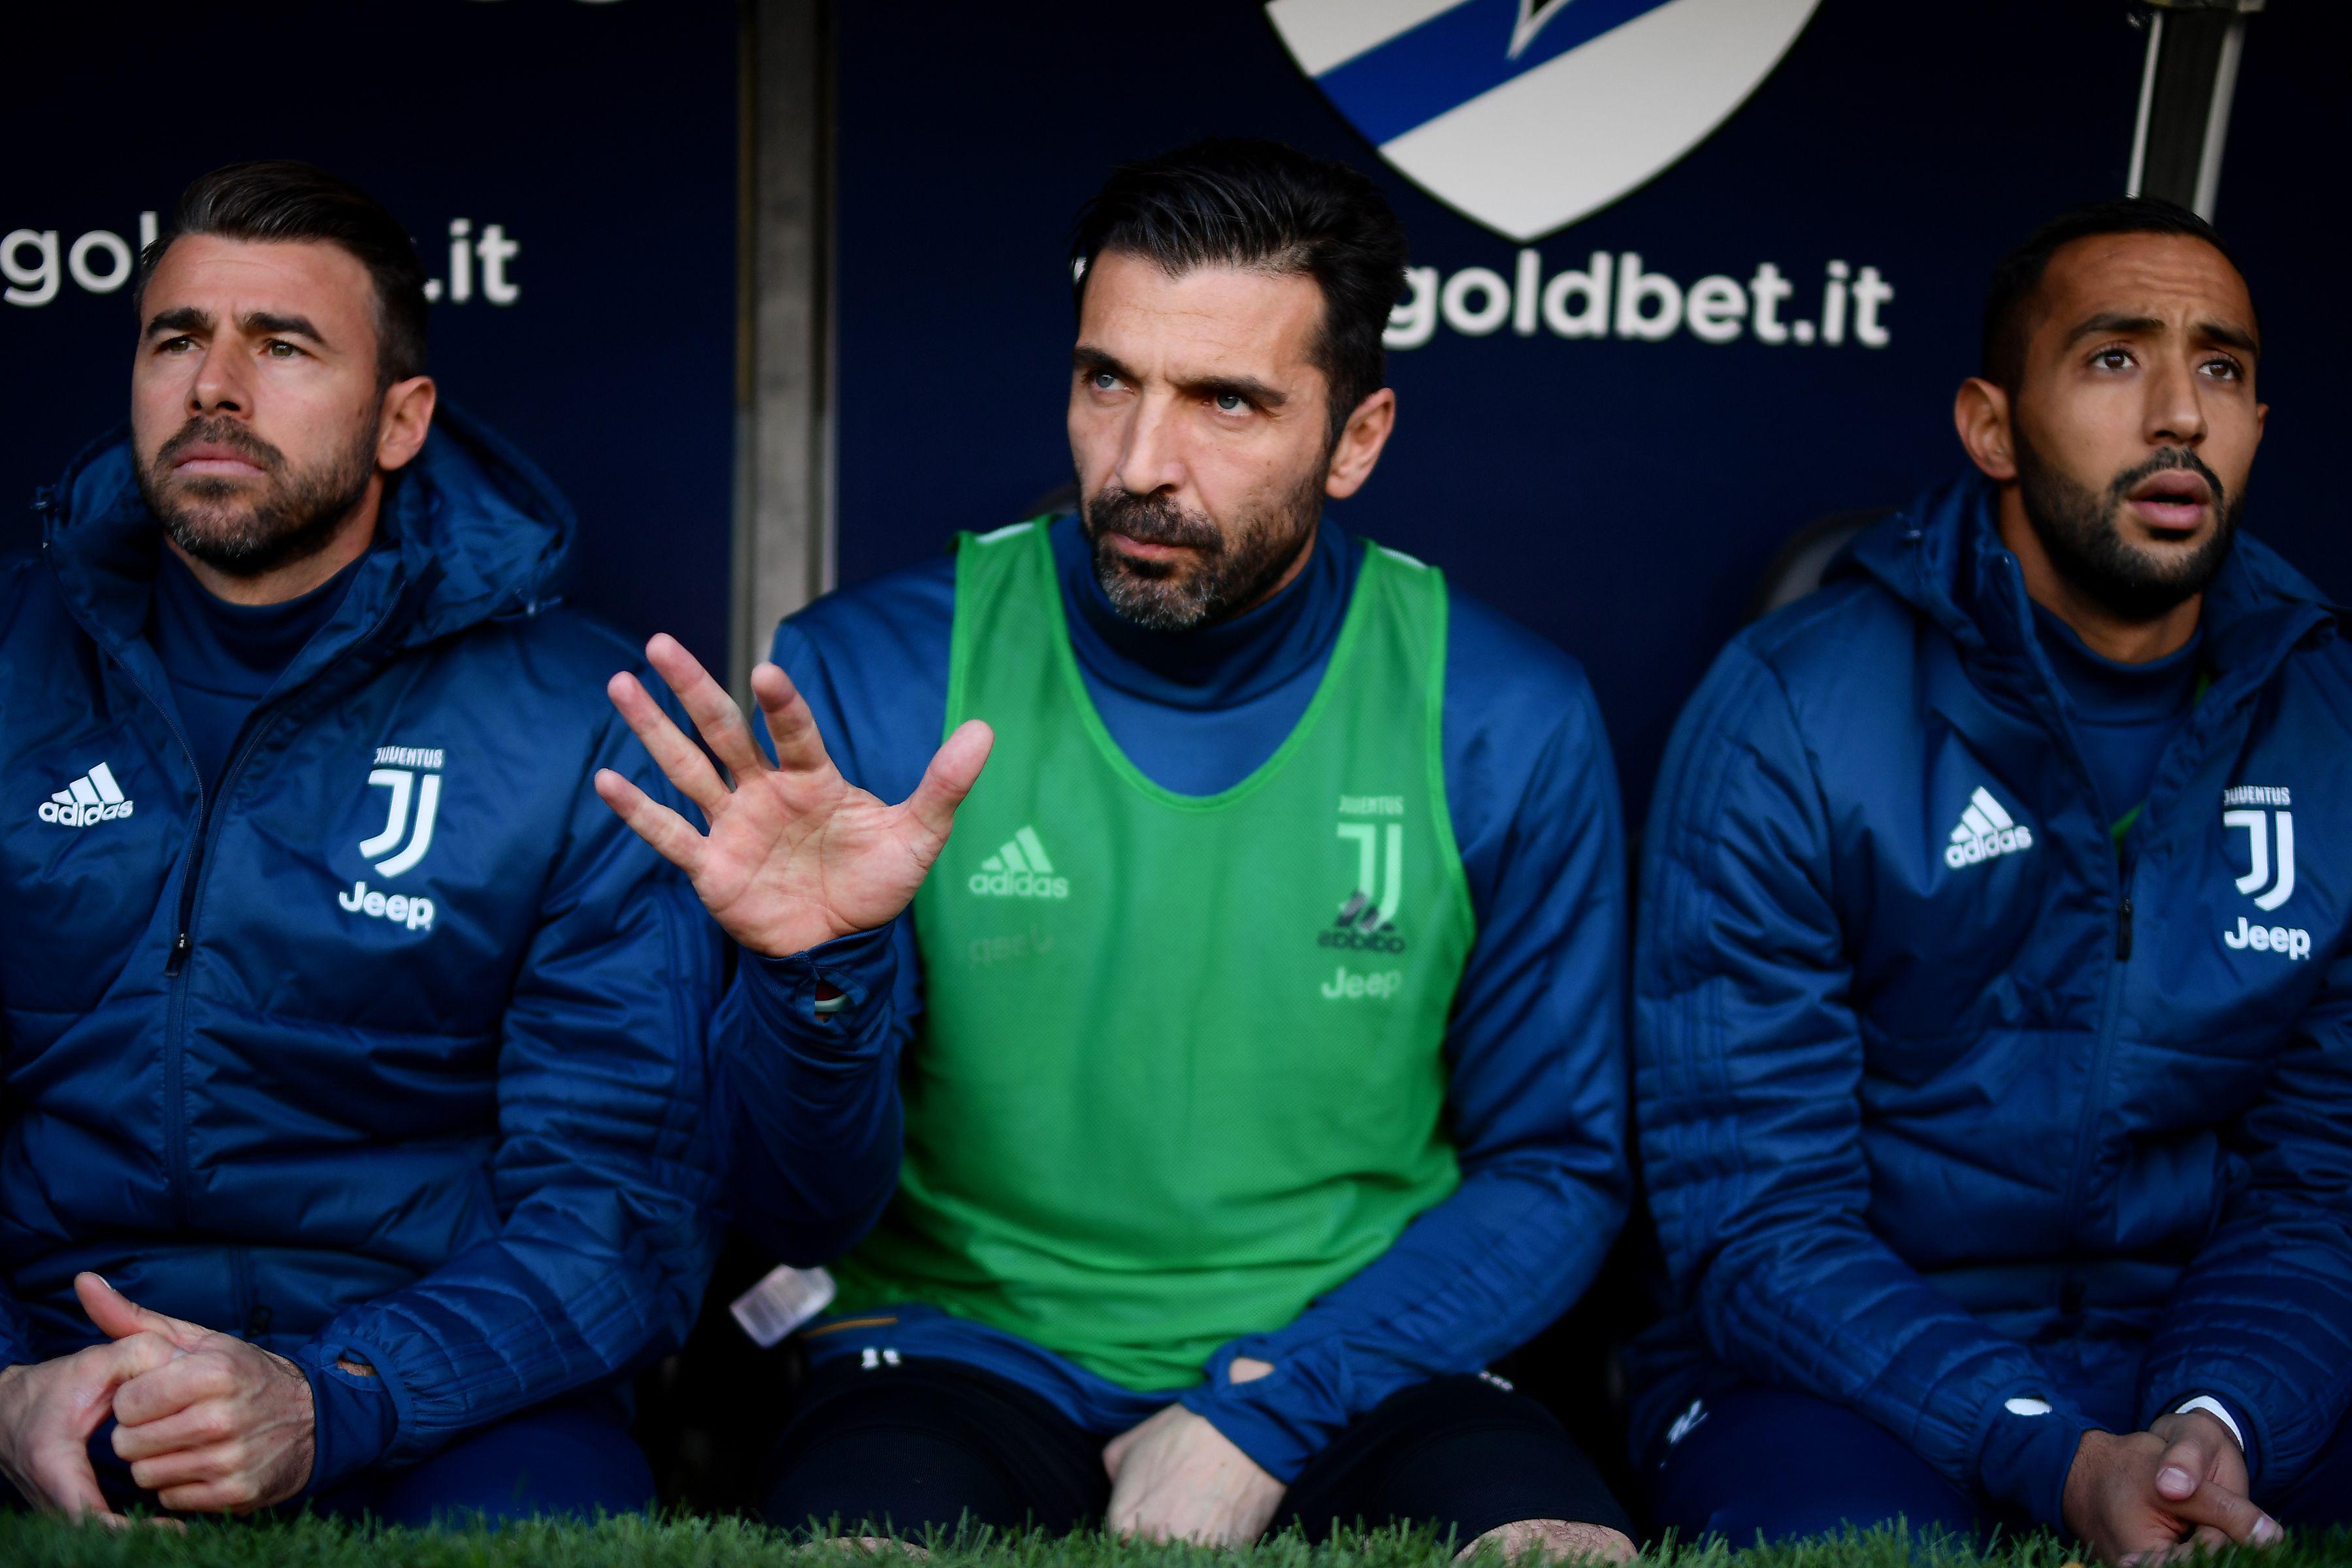 An unfamiliar sight of Buffon warming a bench